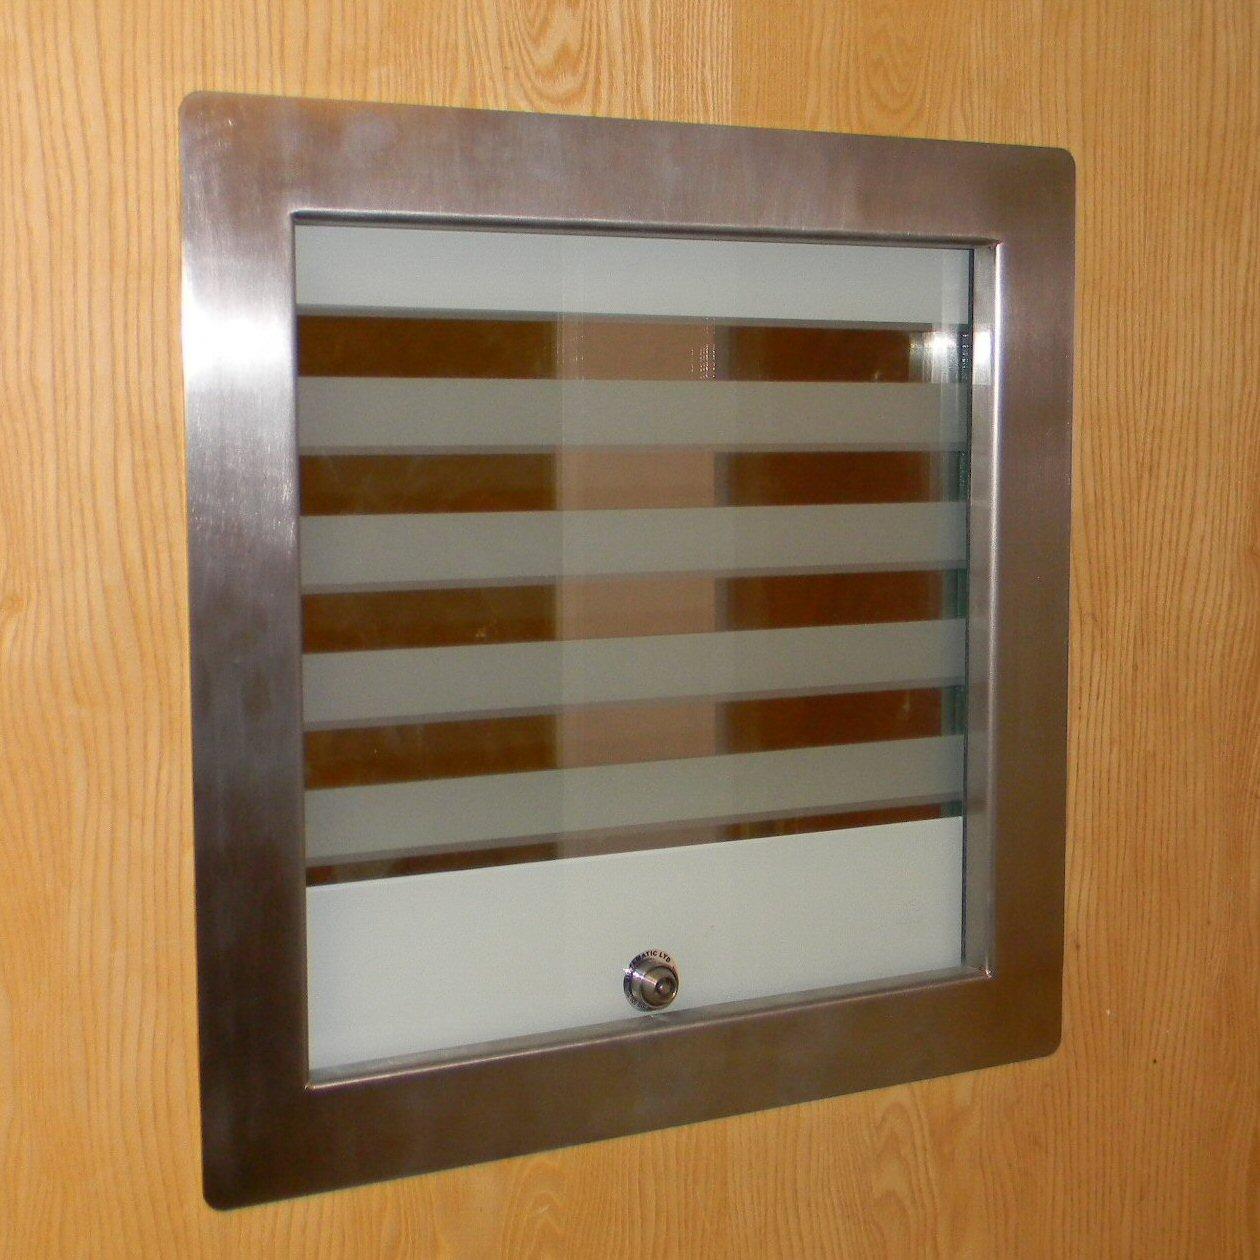 New vistamatic vision panel sets anti ligature standard for Door vision panel